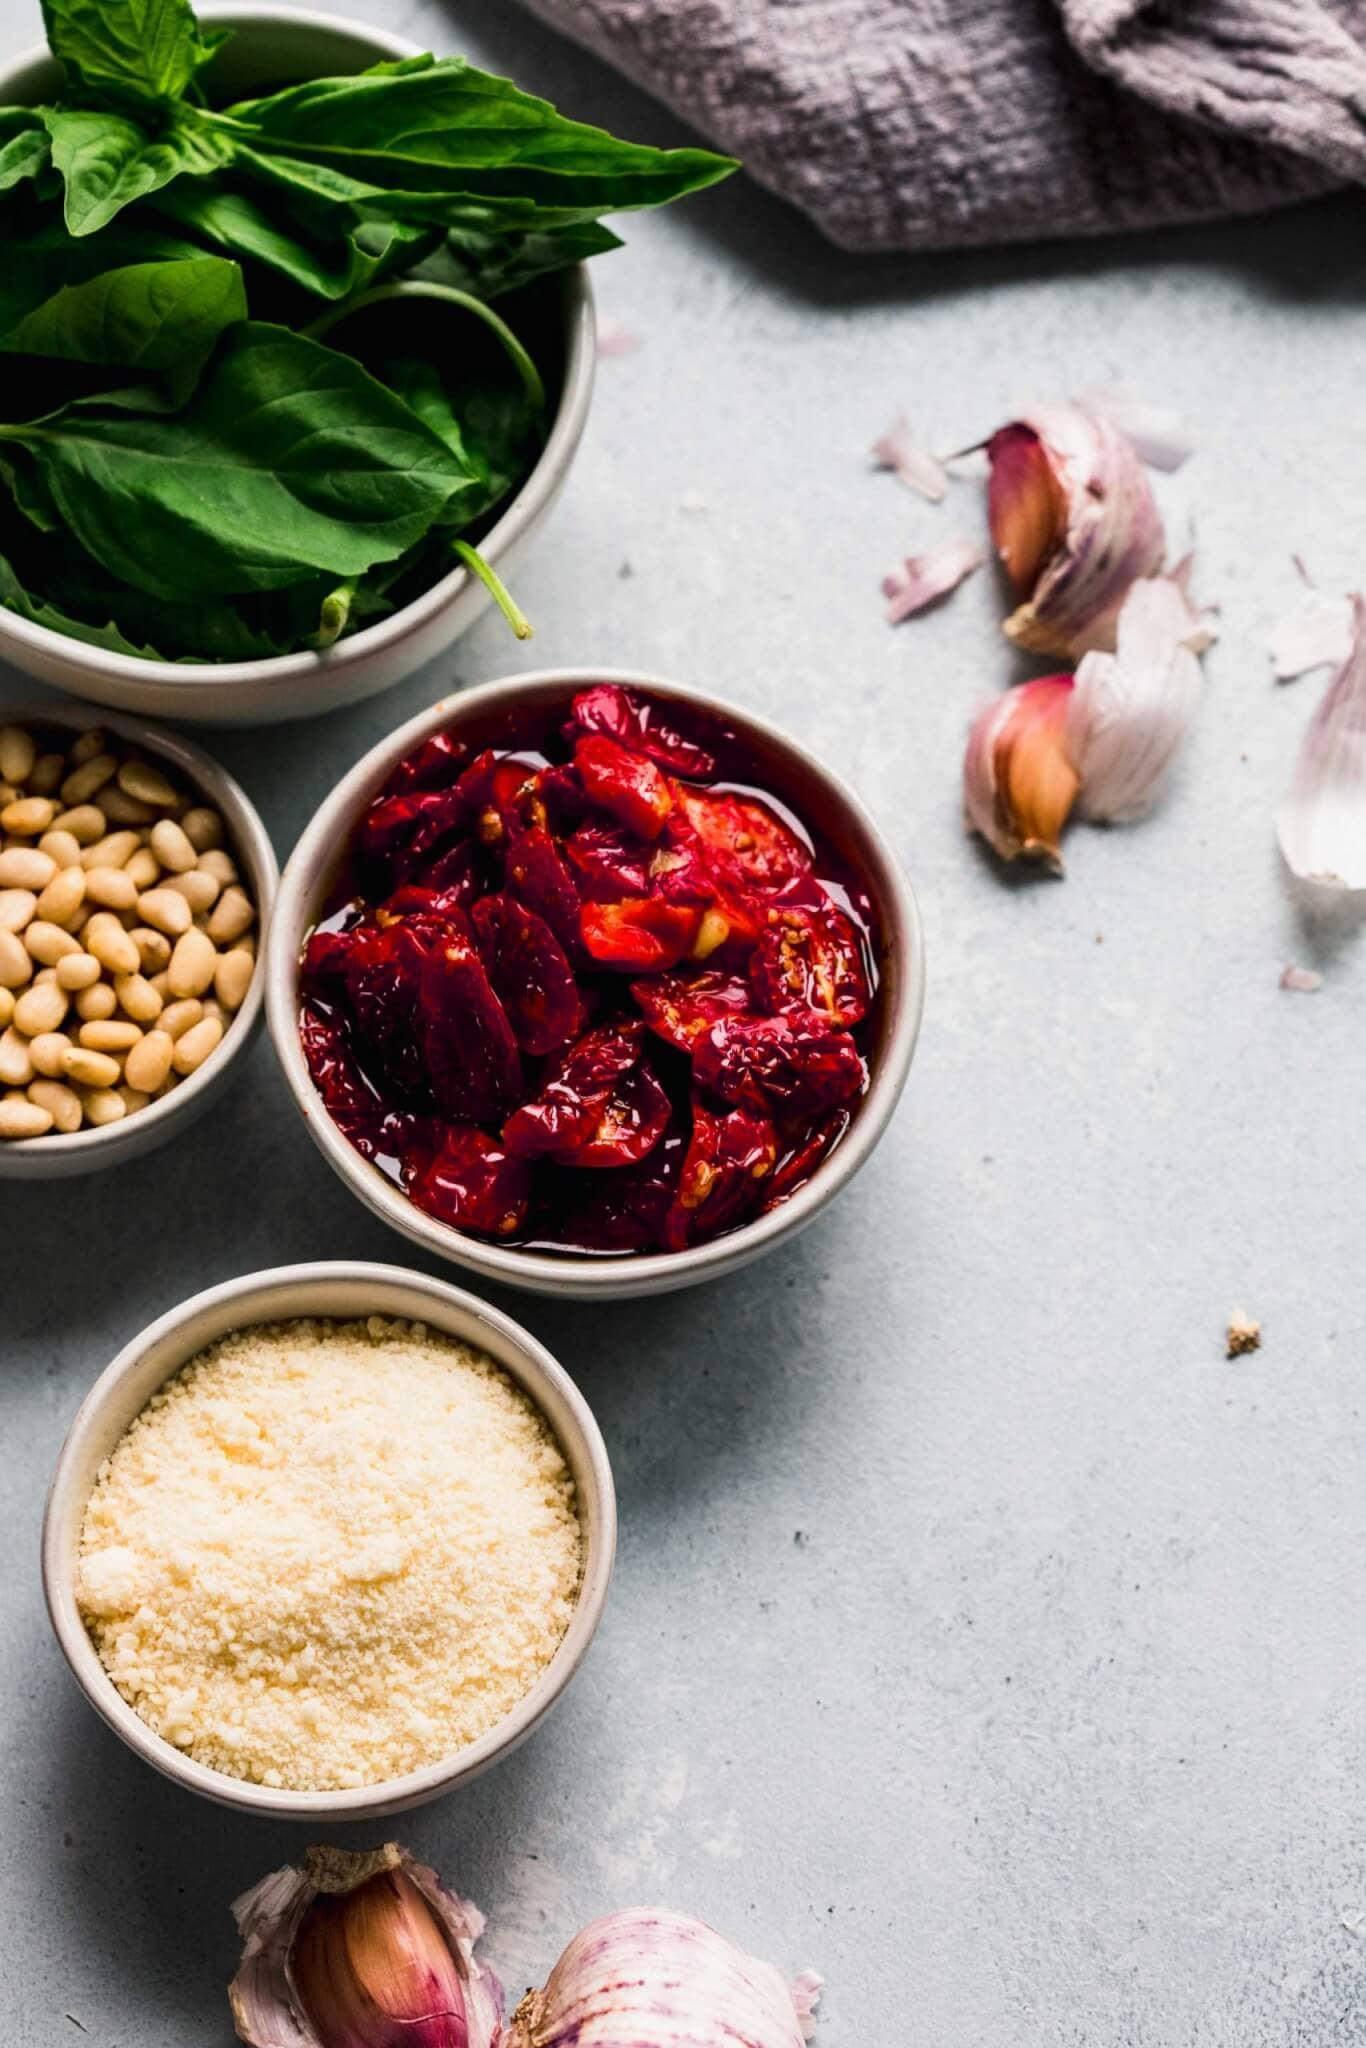 Ingredients for pesto on countertop